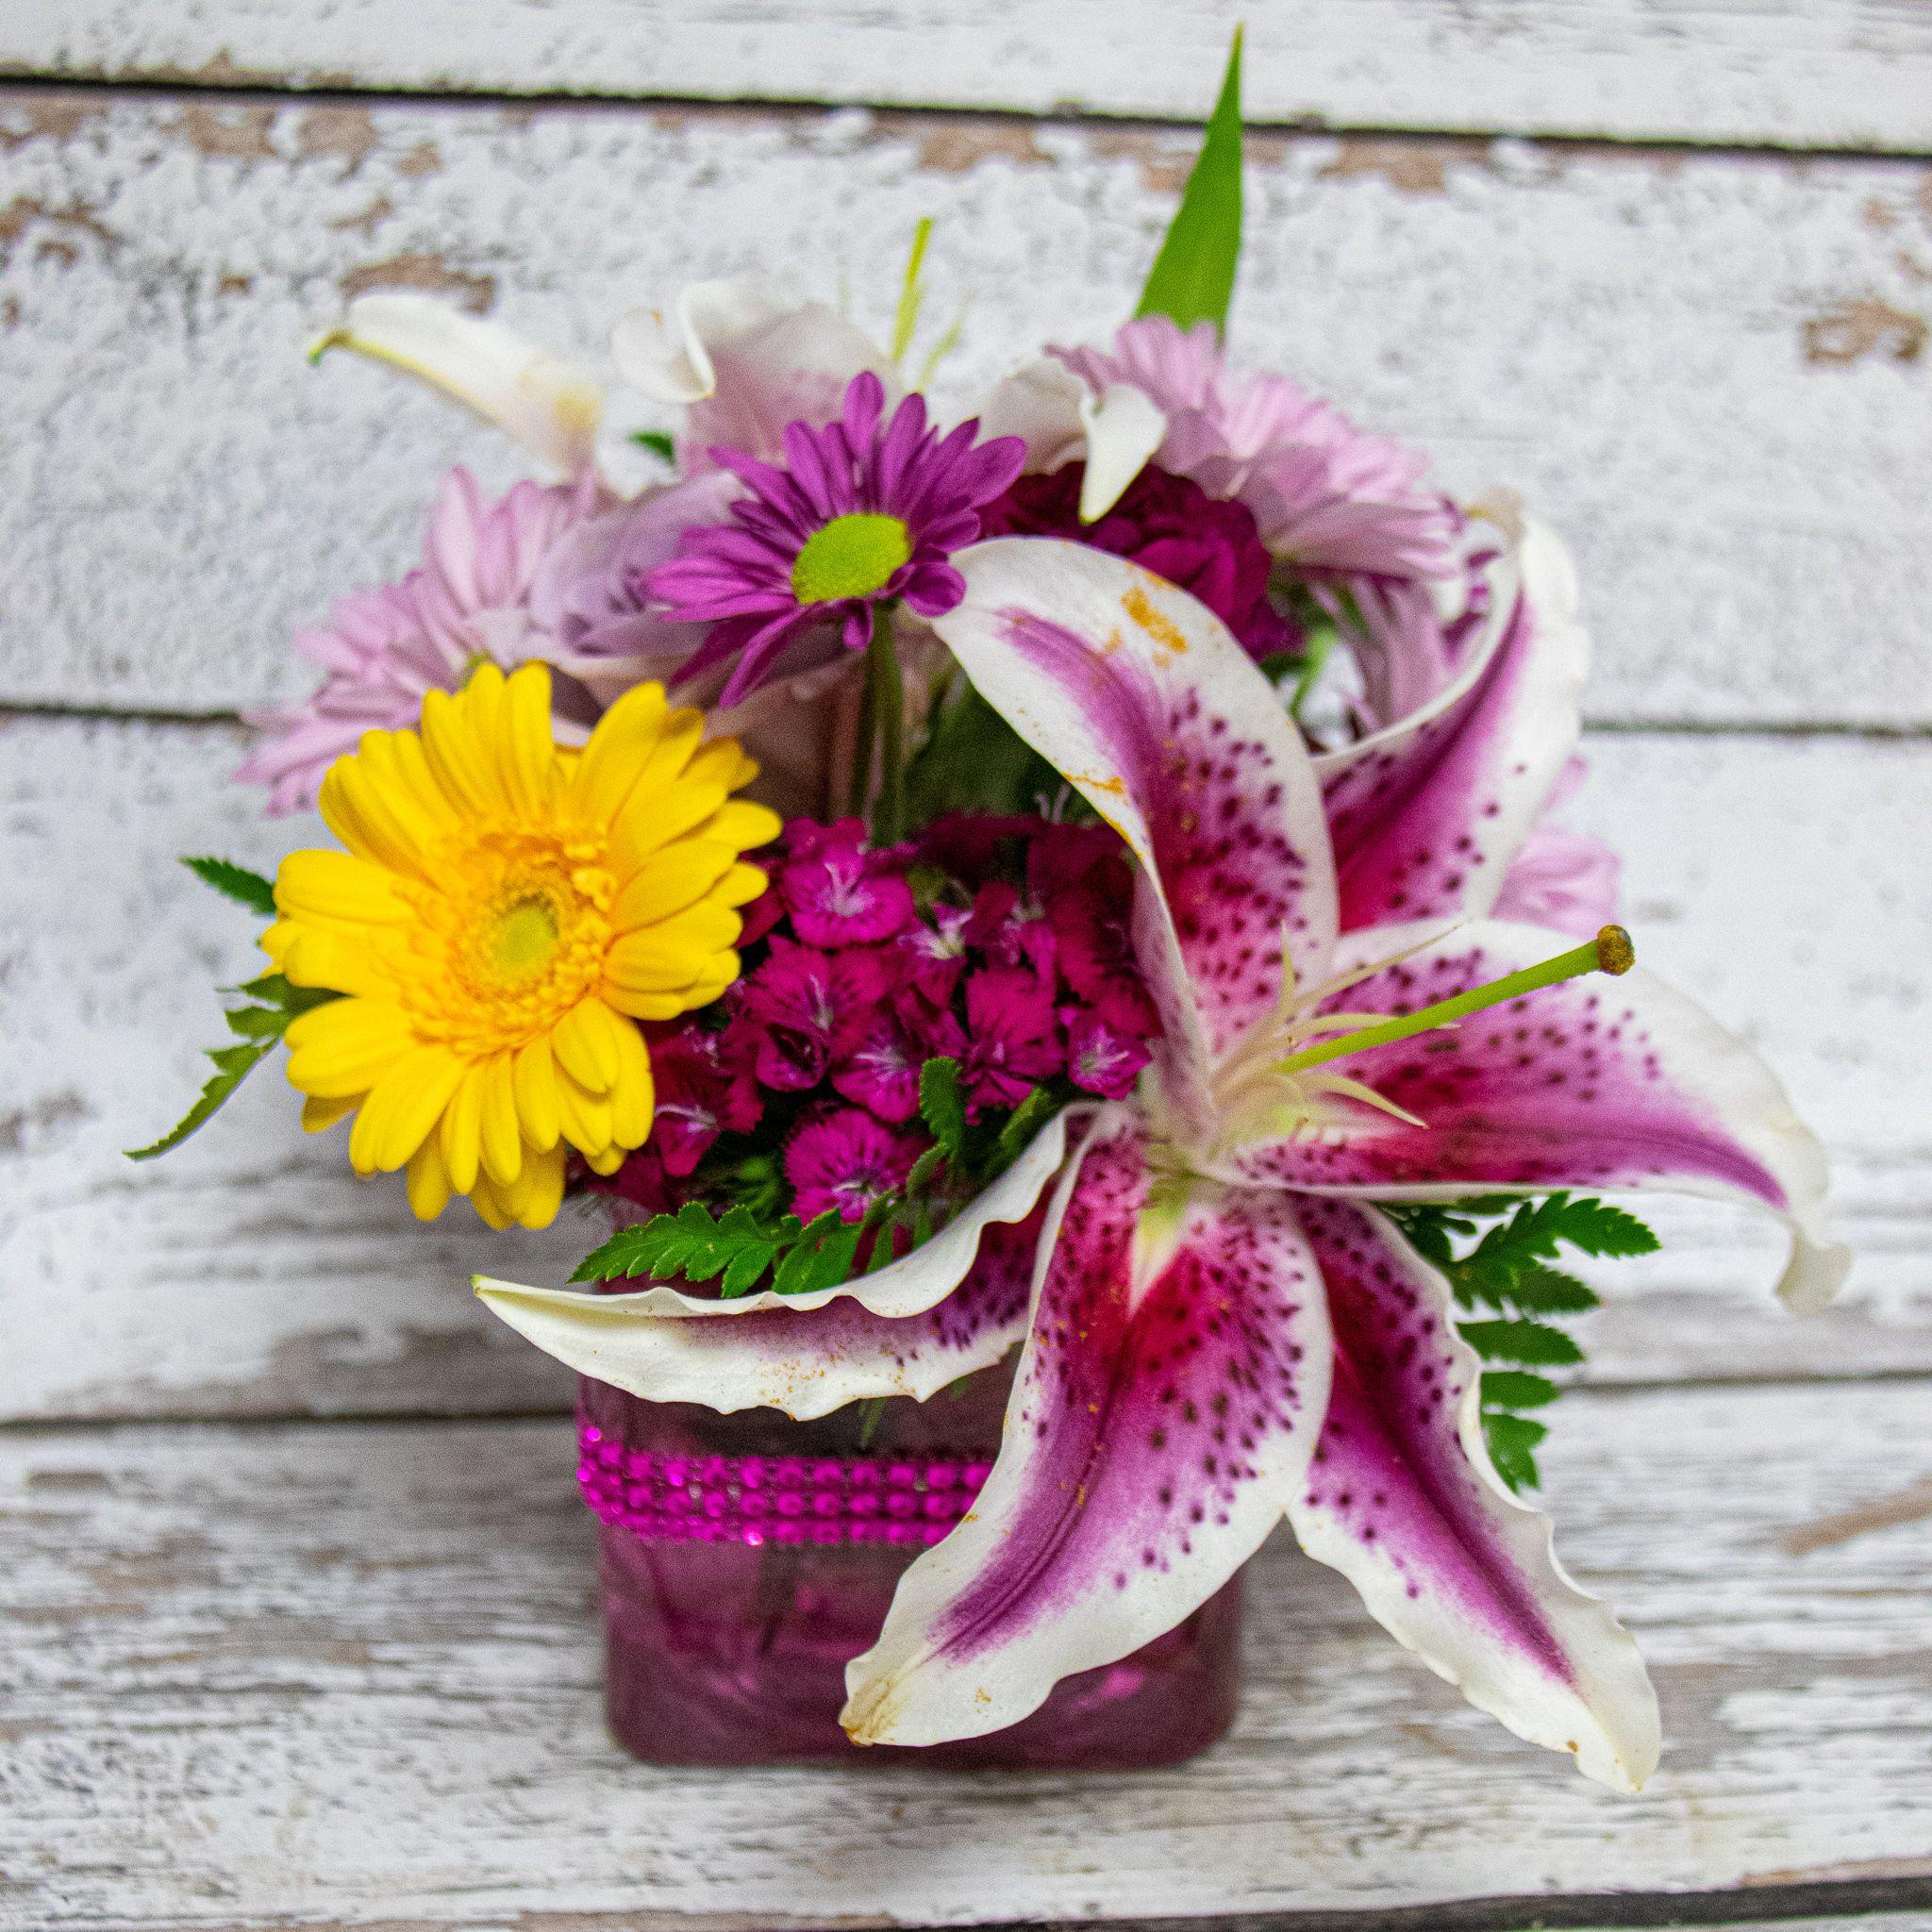 Lilies in pink flower delivery flower arrangements